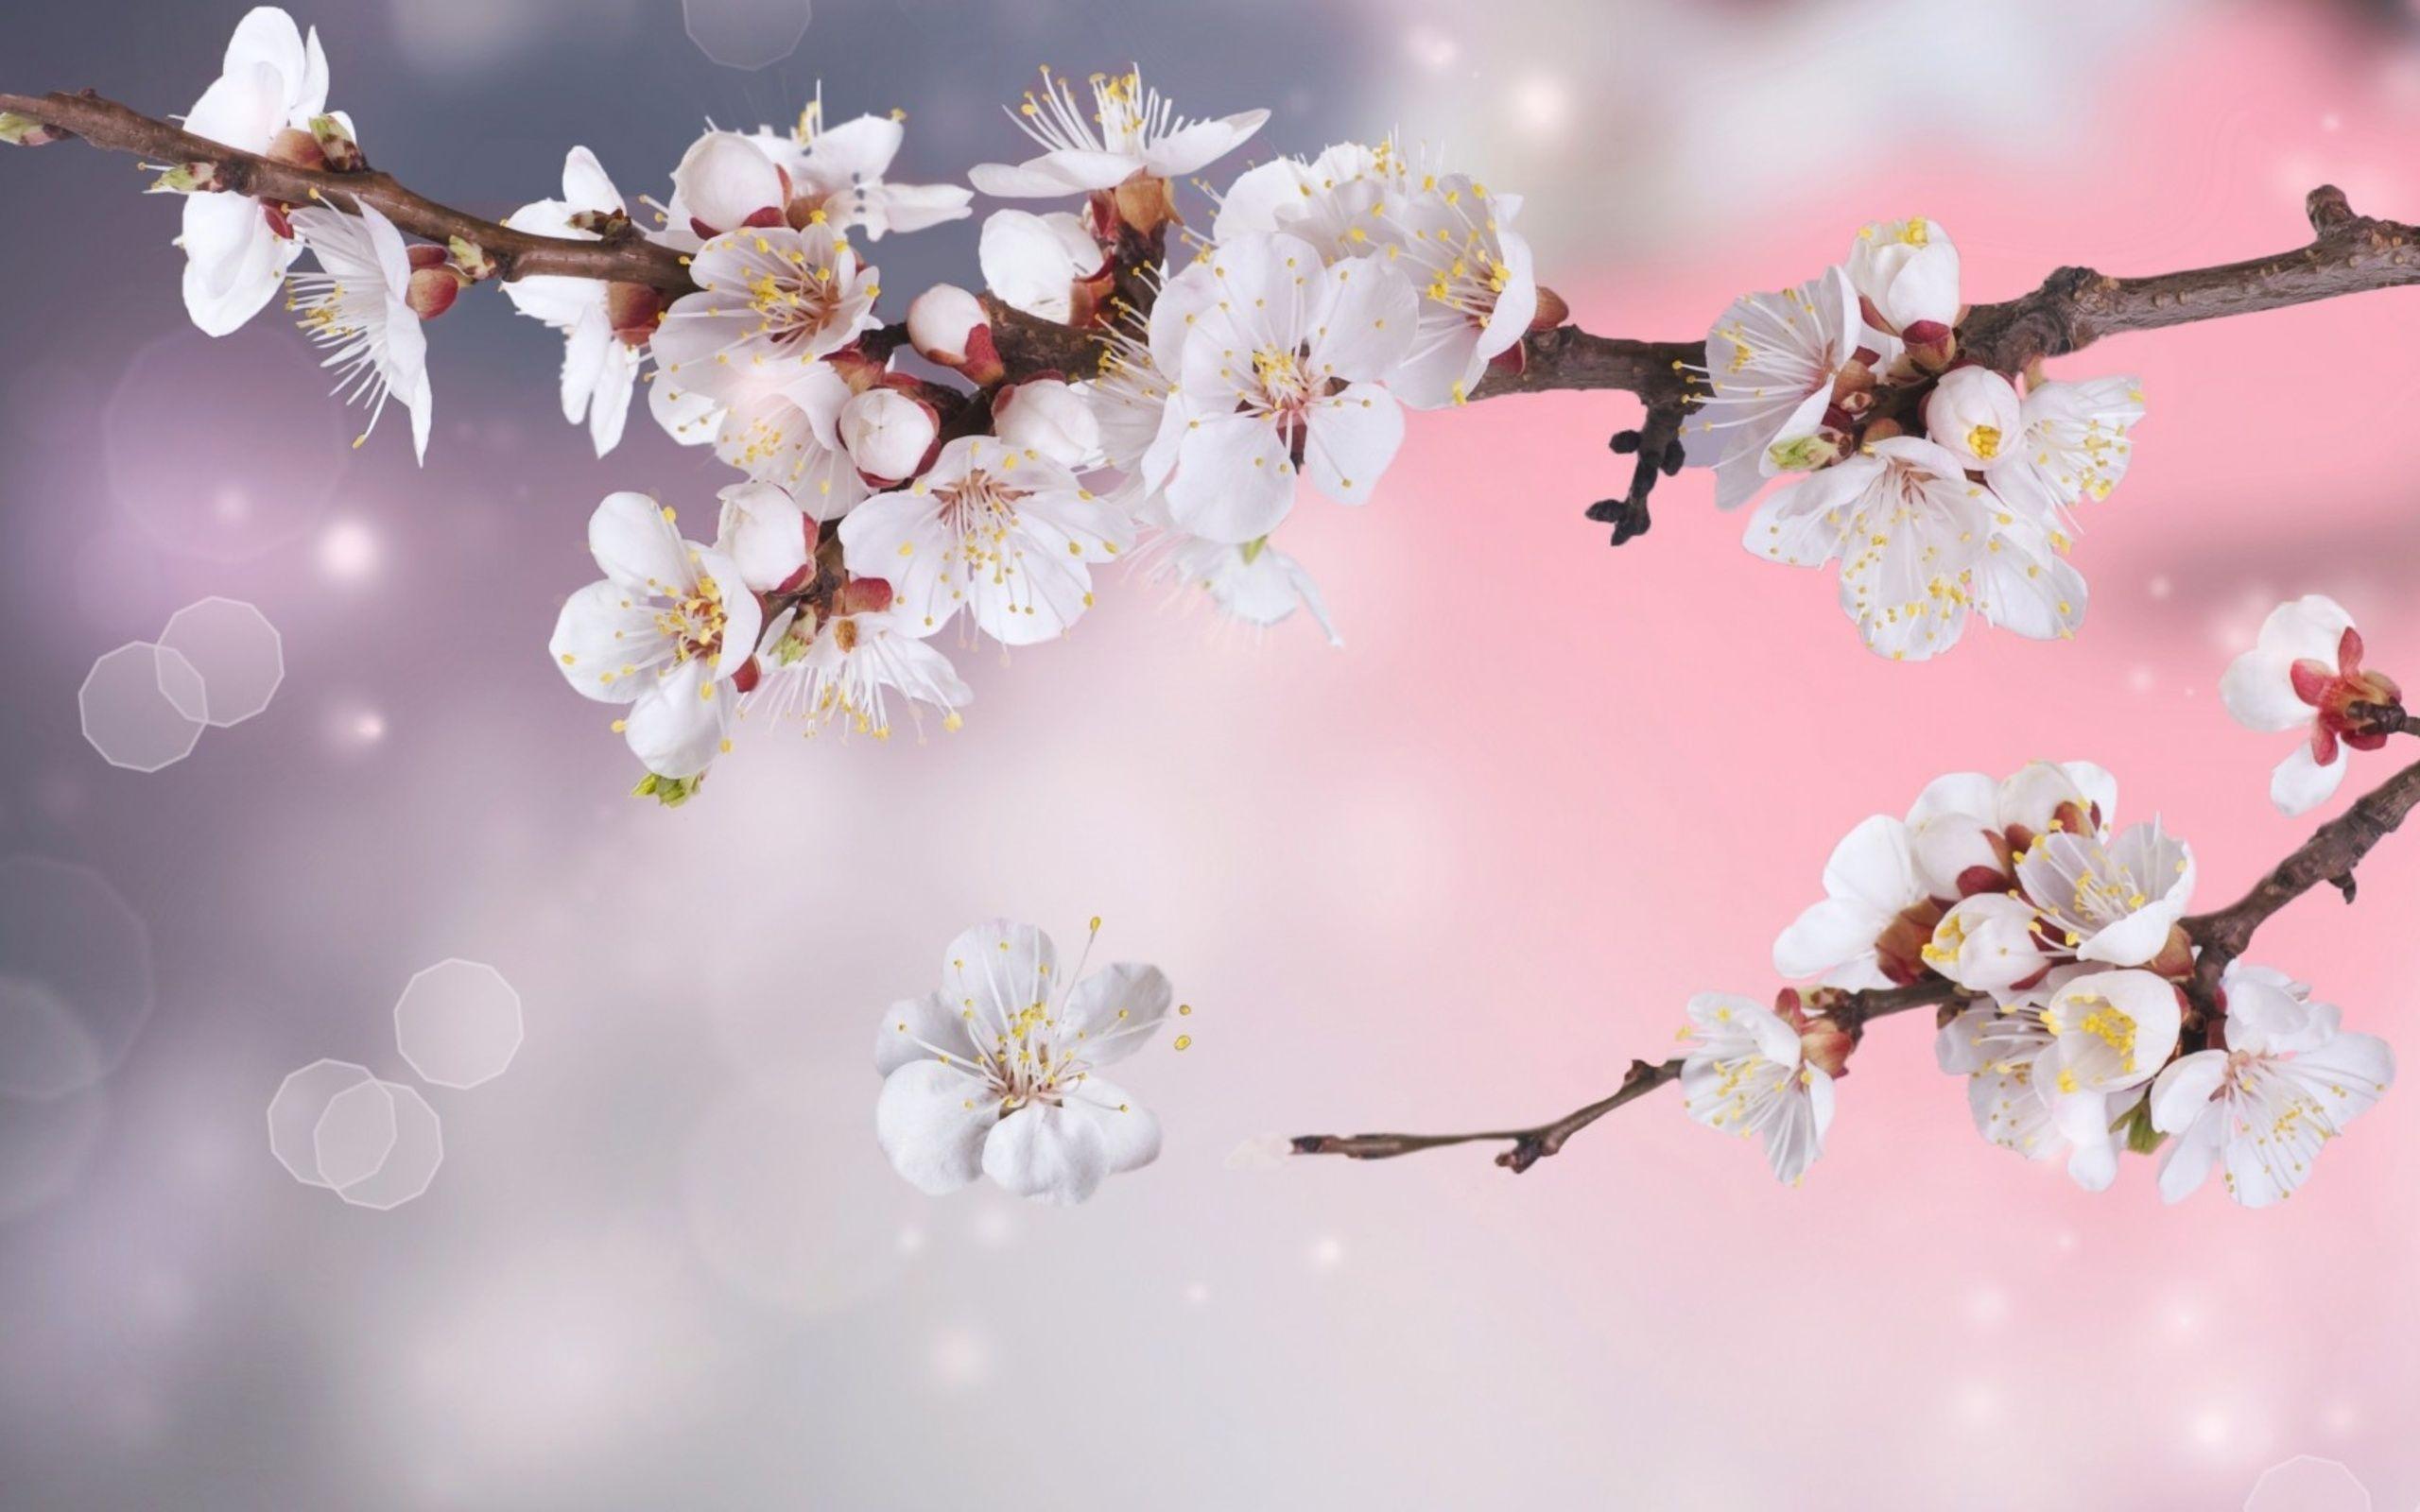 Flowers Wallpaper White Cherry Blossoms Wallpaper Desktop White Cherry Blossom Cherry Blossom Wallpaper Blossom